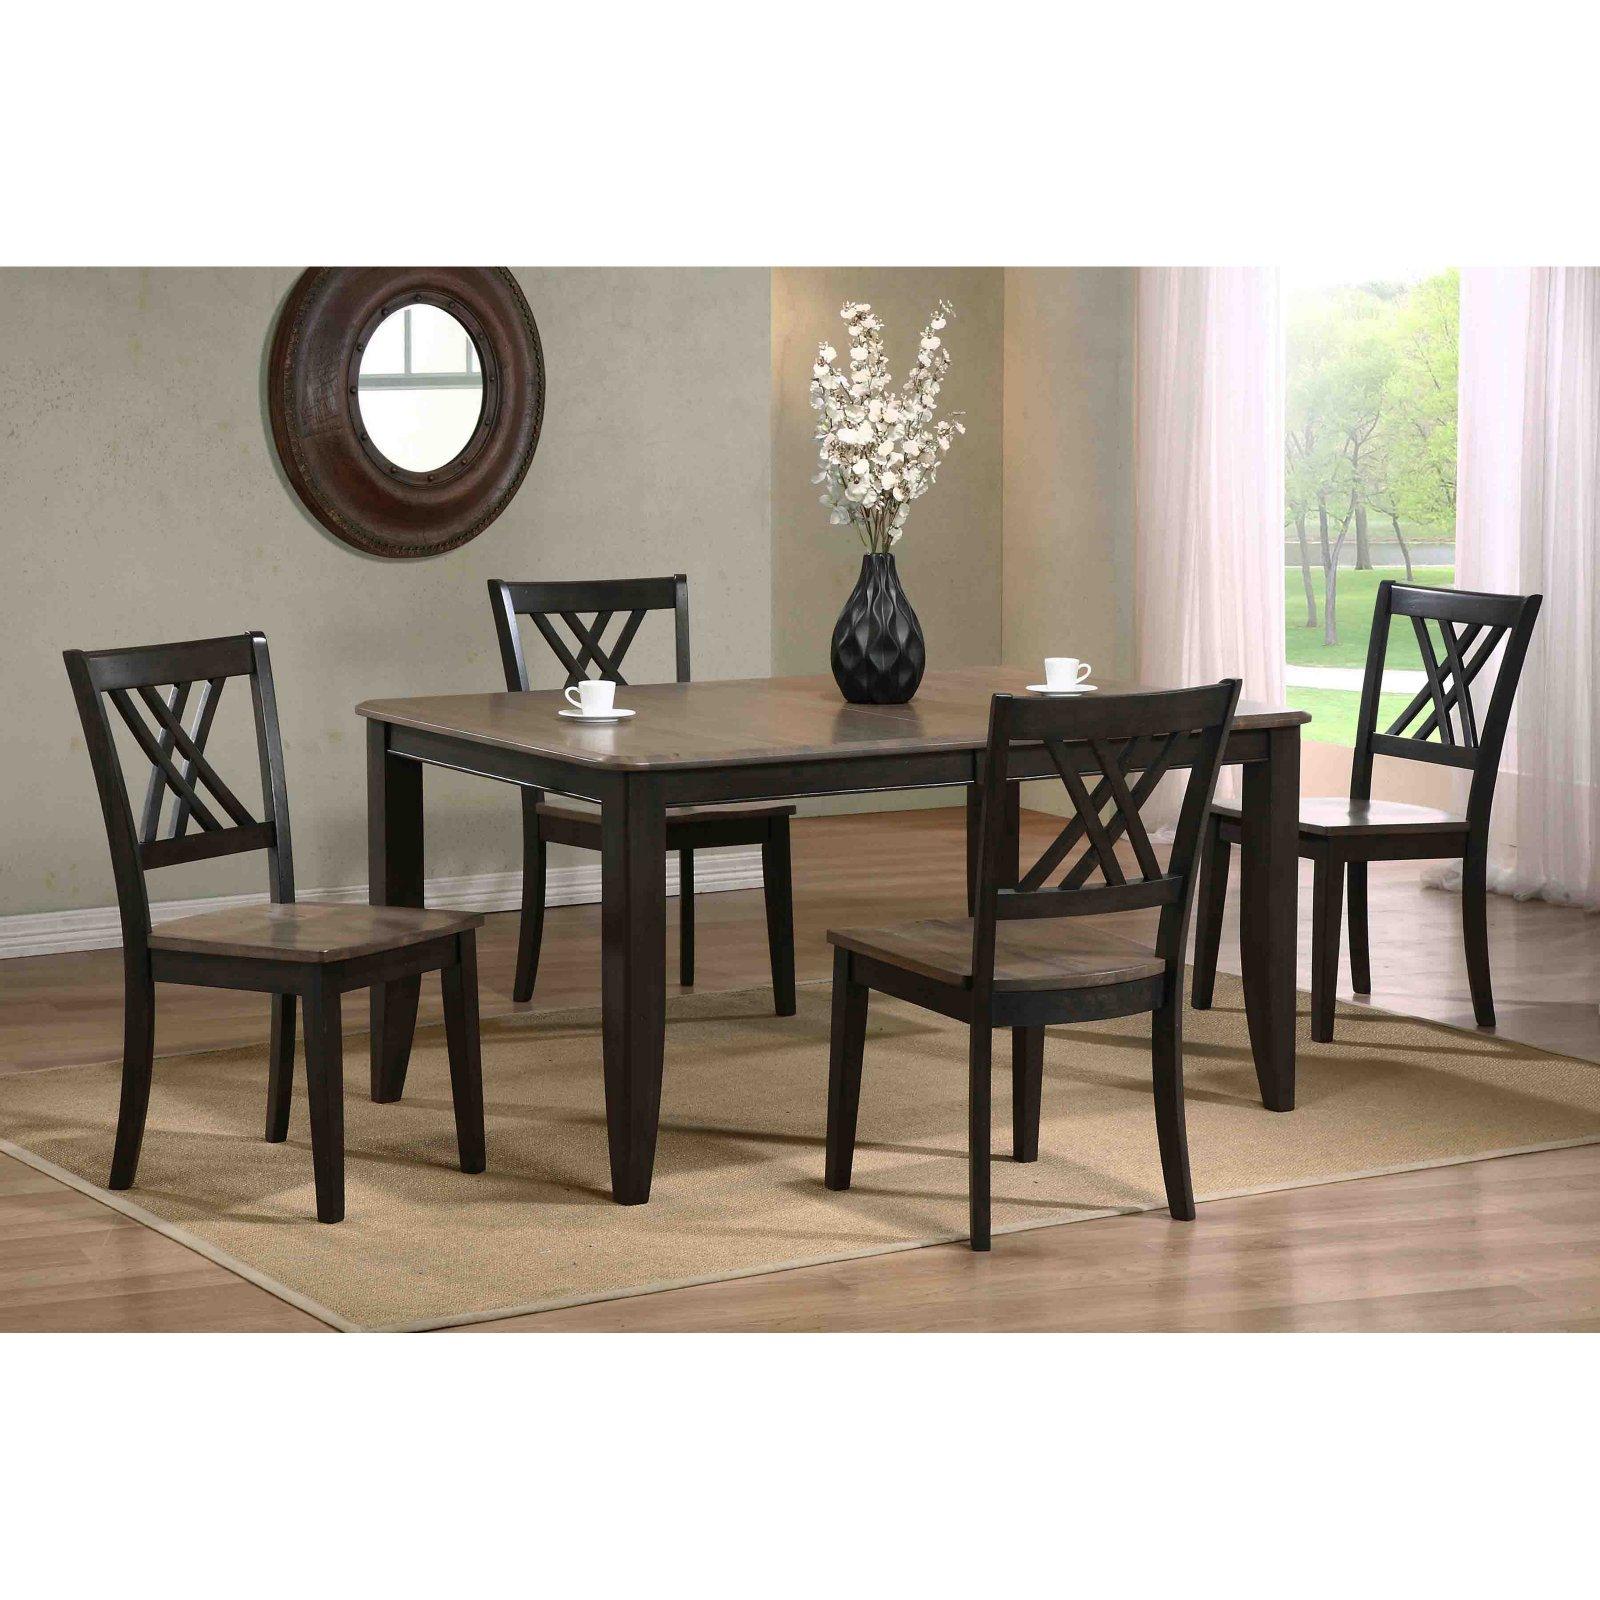 Iconic Furniture 5 Piece Rectangular Dining Table Set - Gray Stone / Black Stone